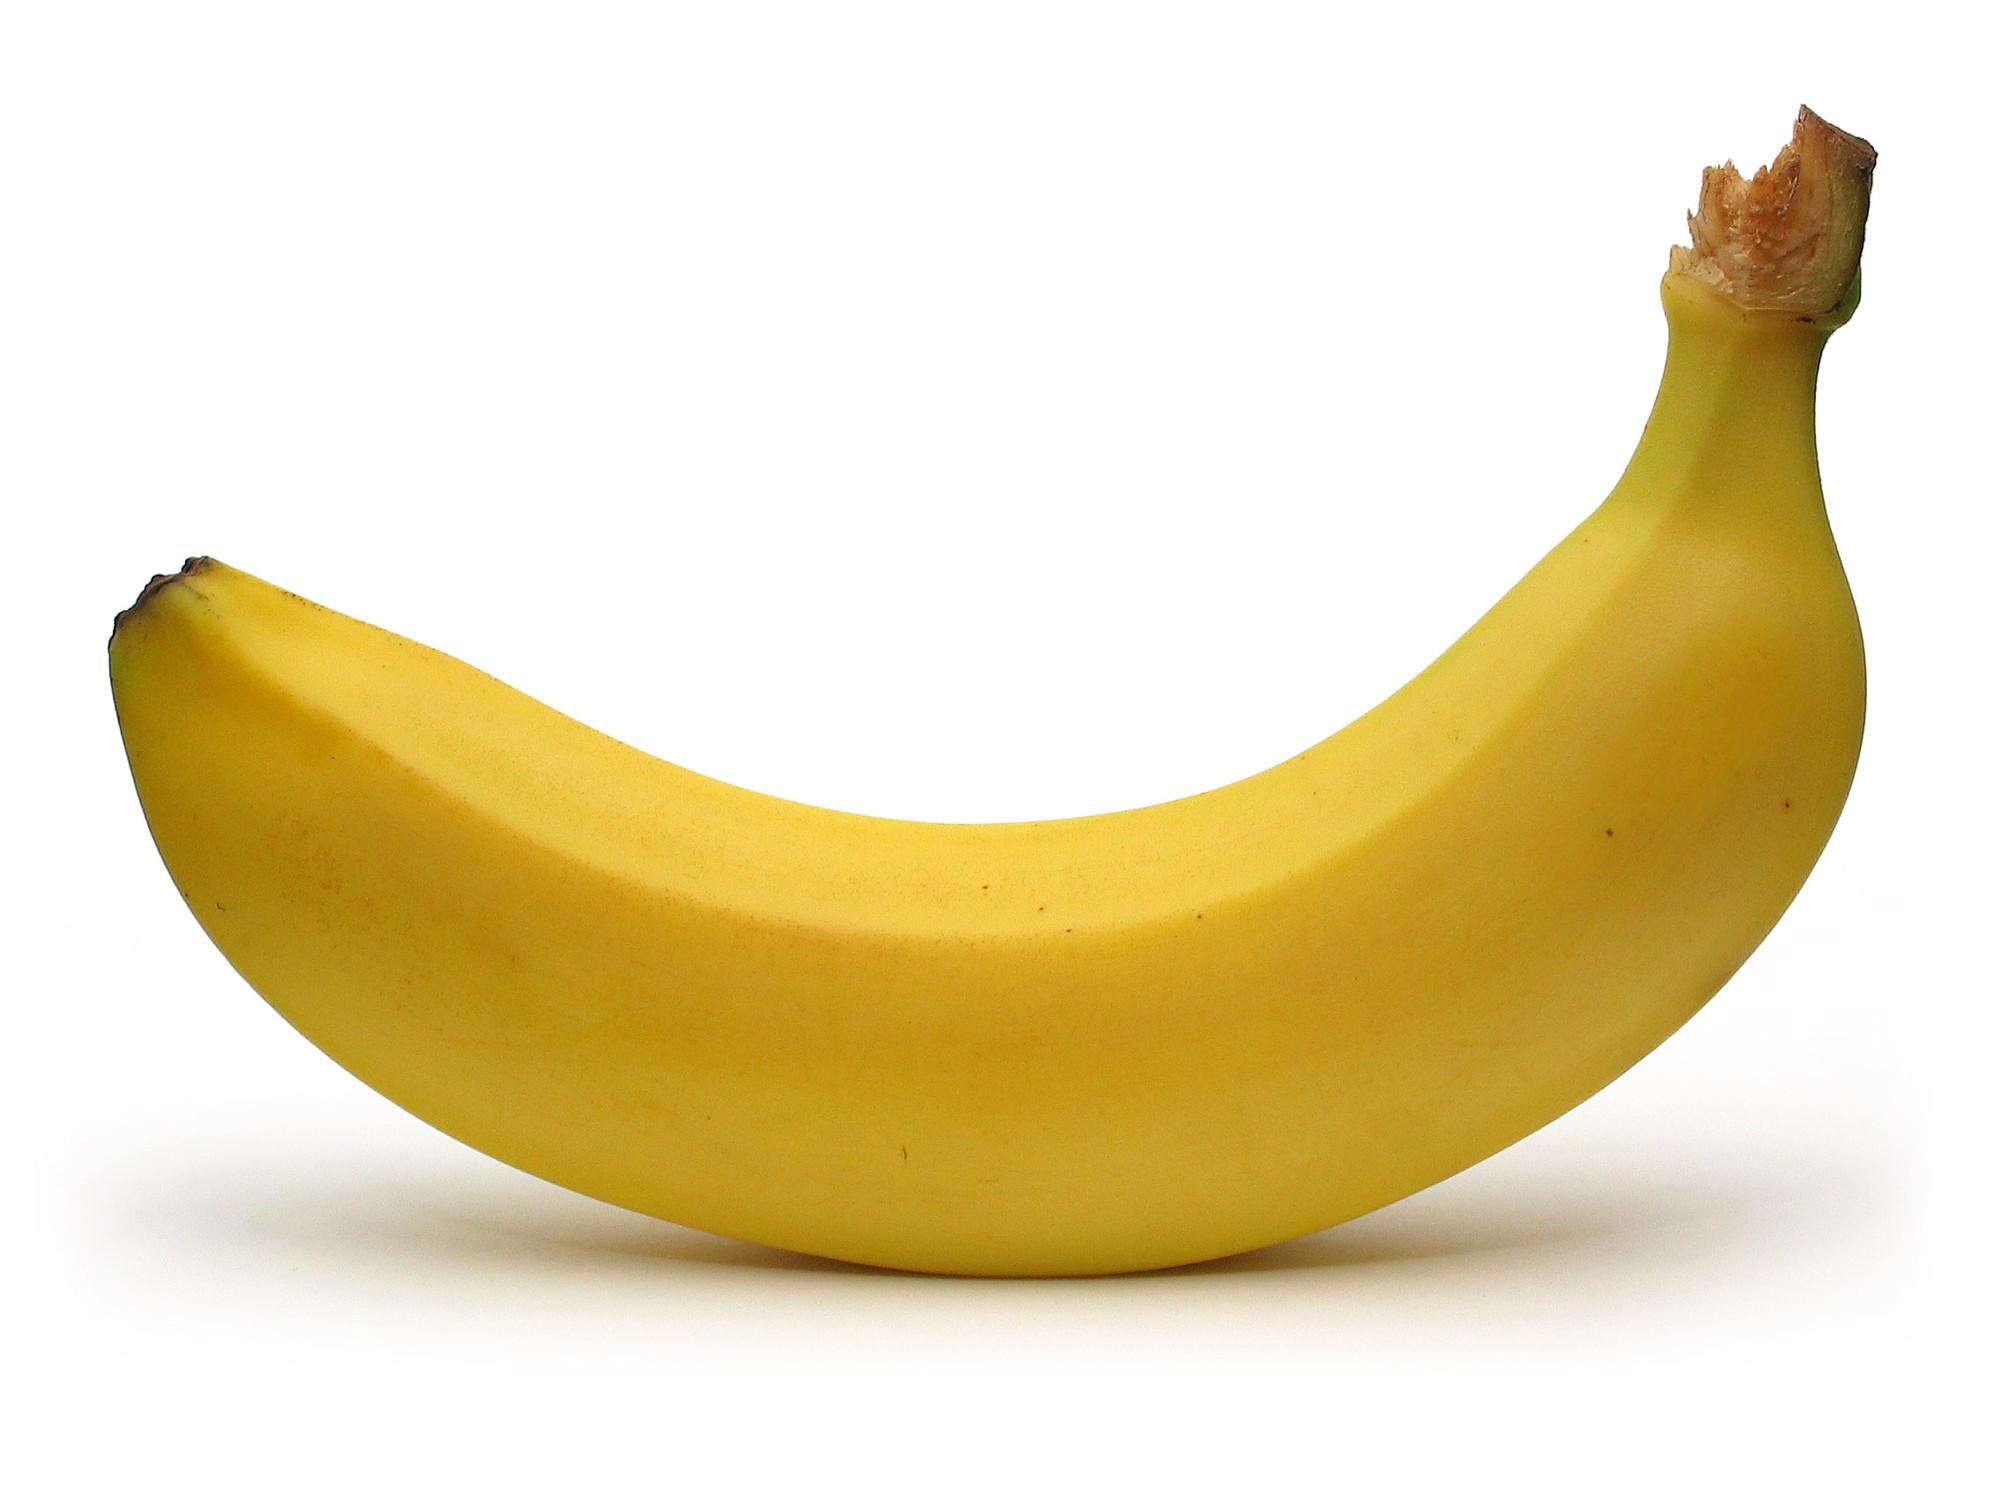 With banana foto 83